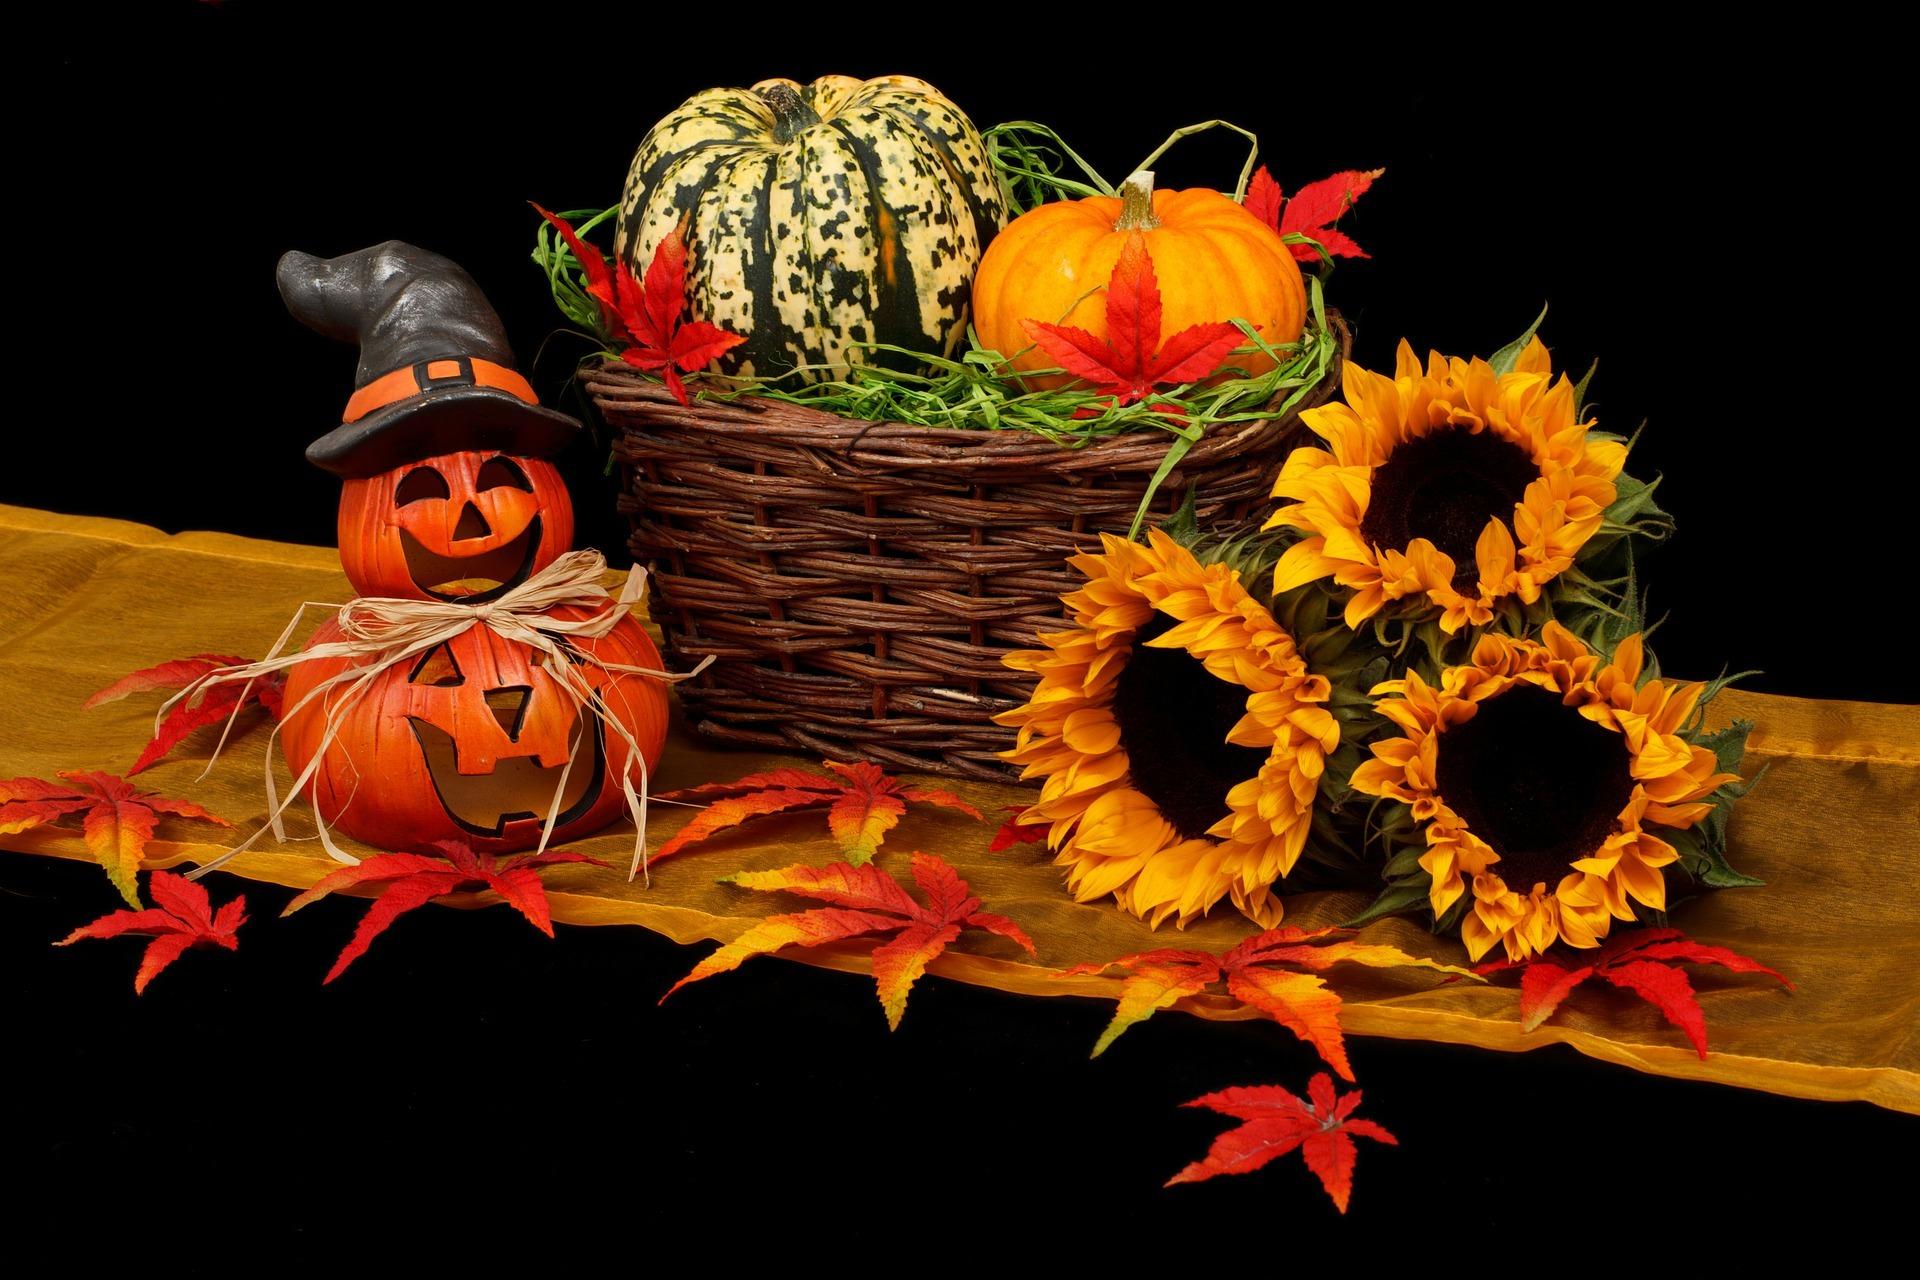 13+ Scary Good Ways To Save Money This Halloween Season